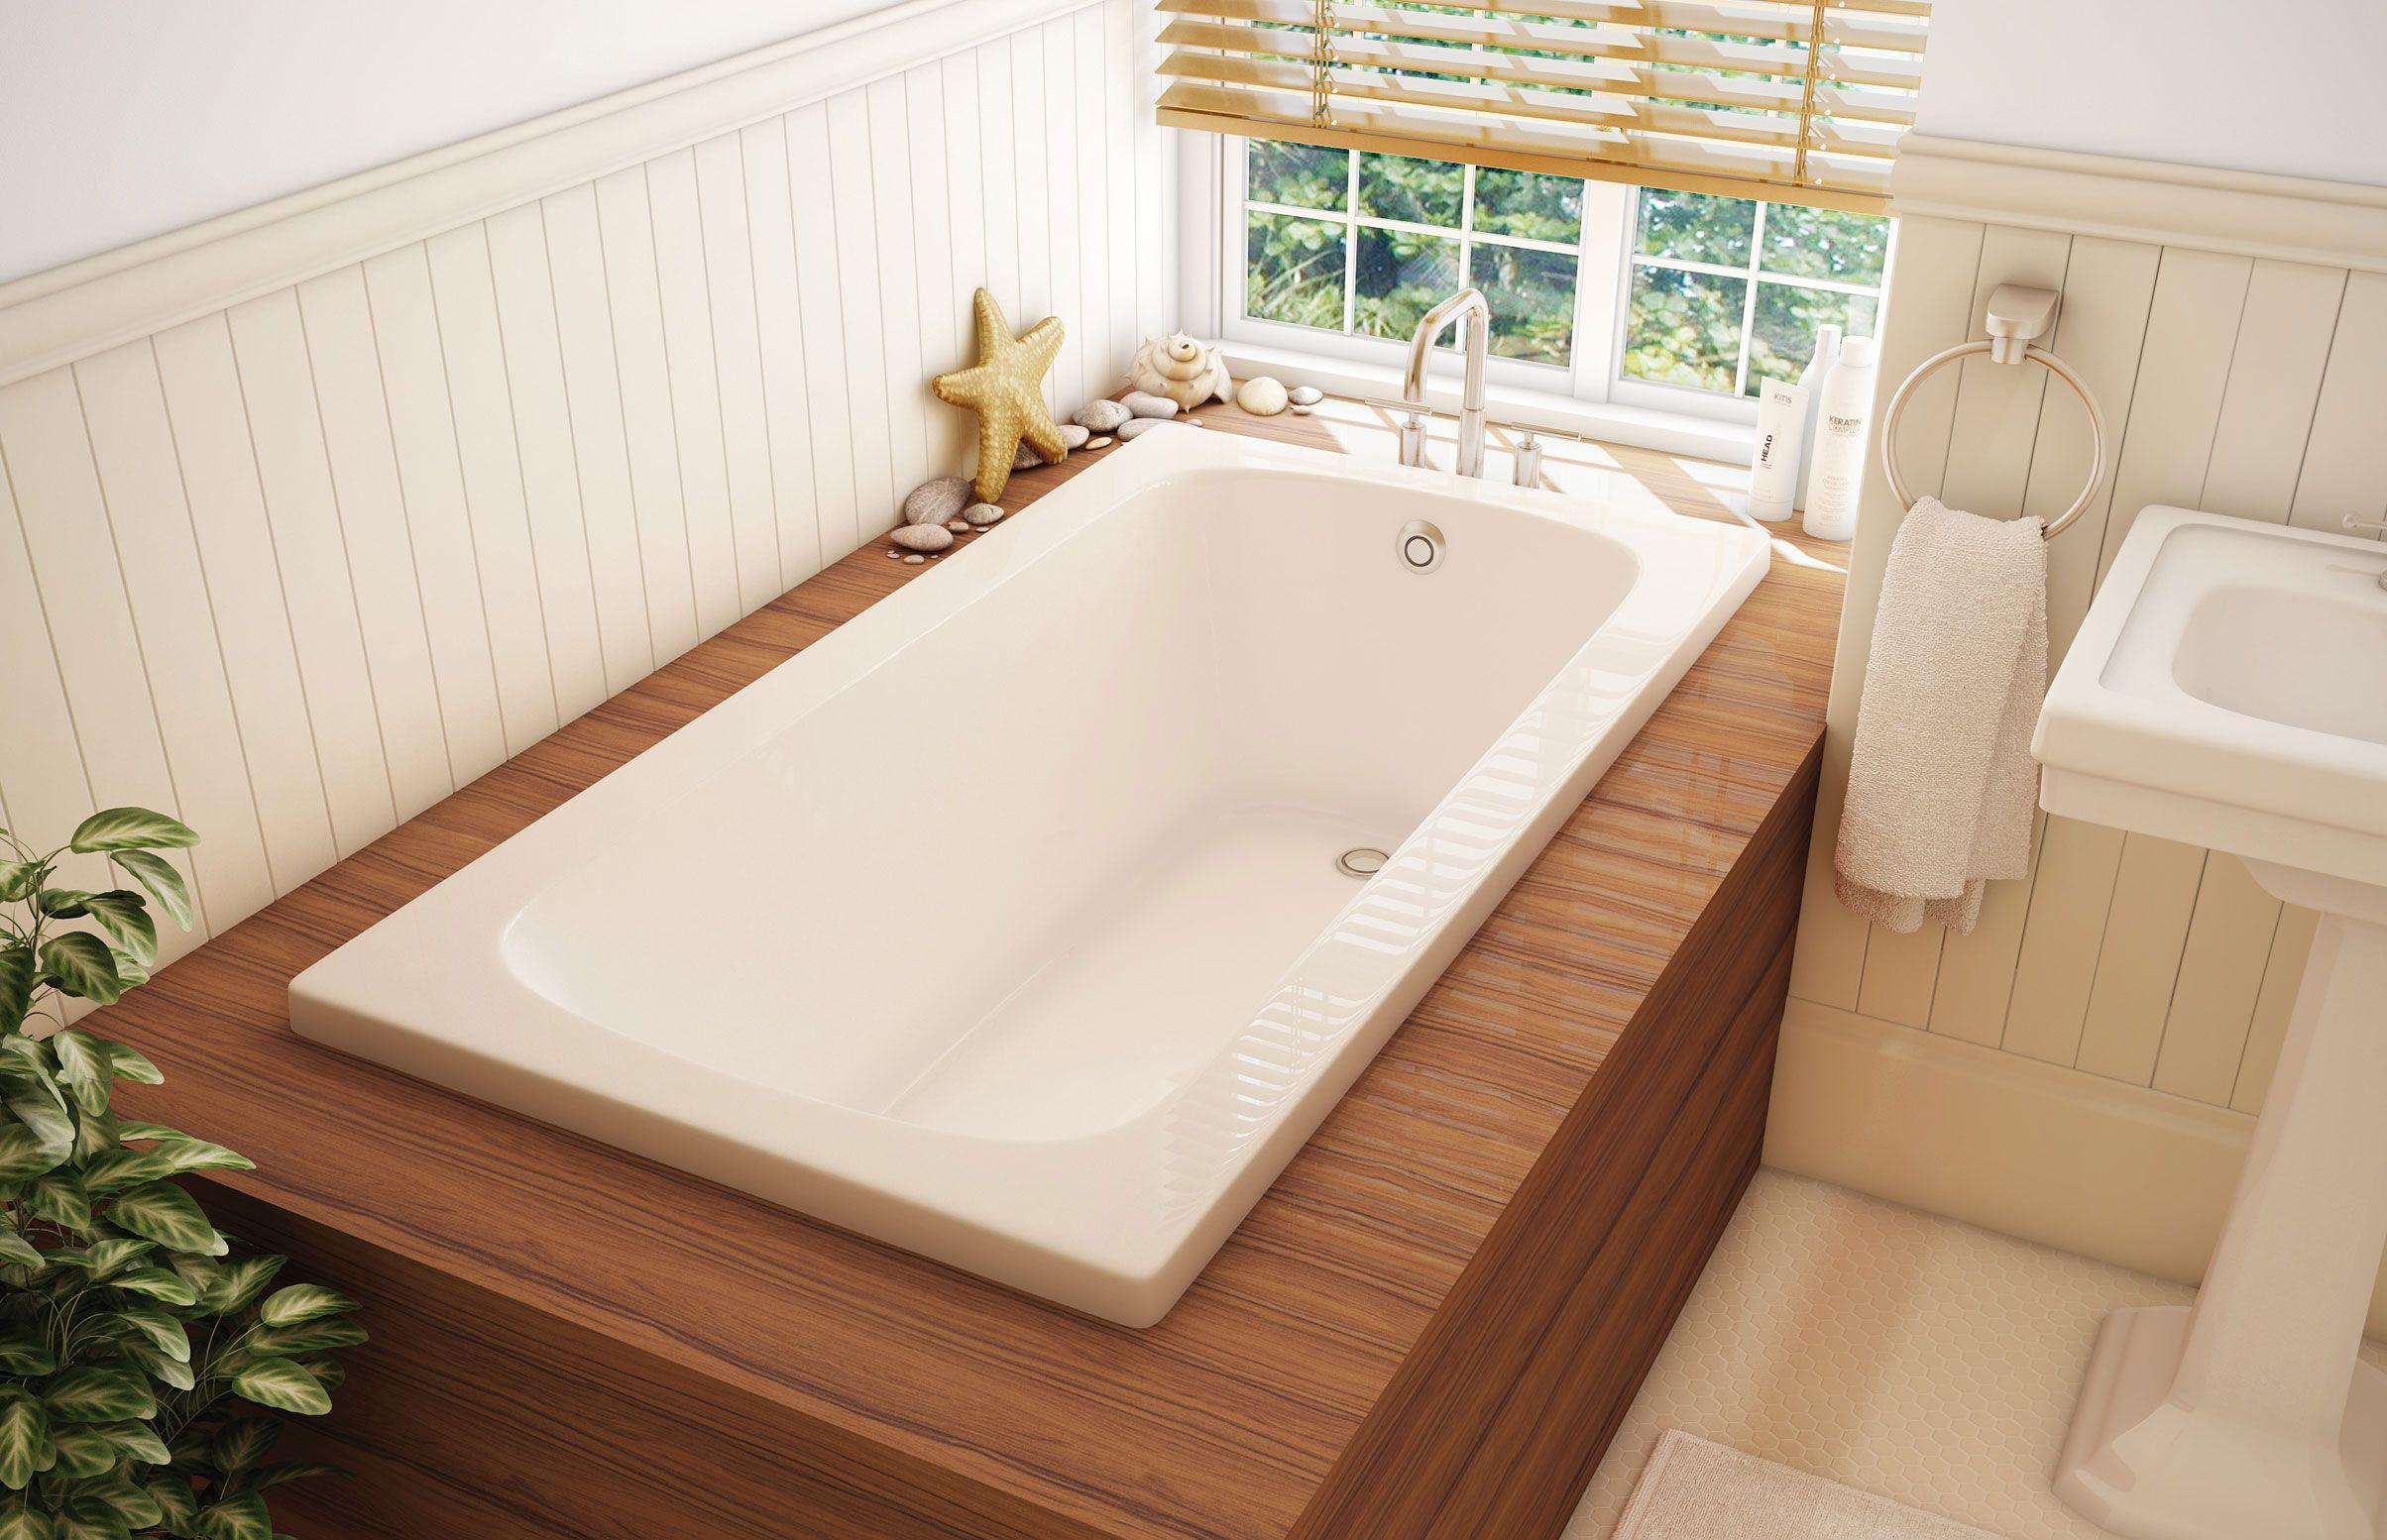 tub is bathtub mirabelle long maax edenton tubs a shower fixtures standard dimensions reviews how ferguson americast